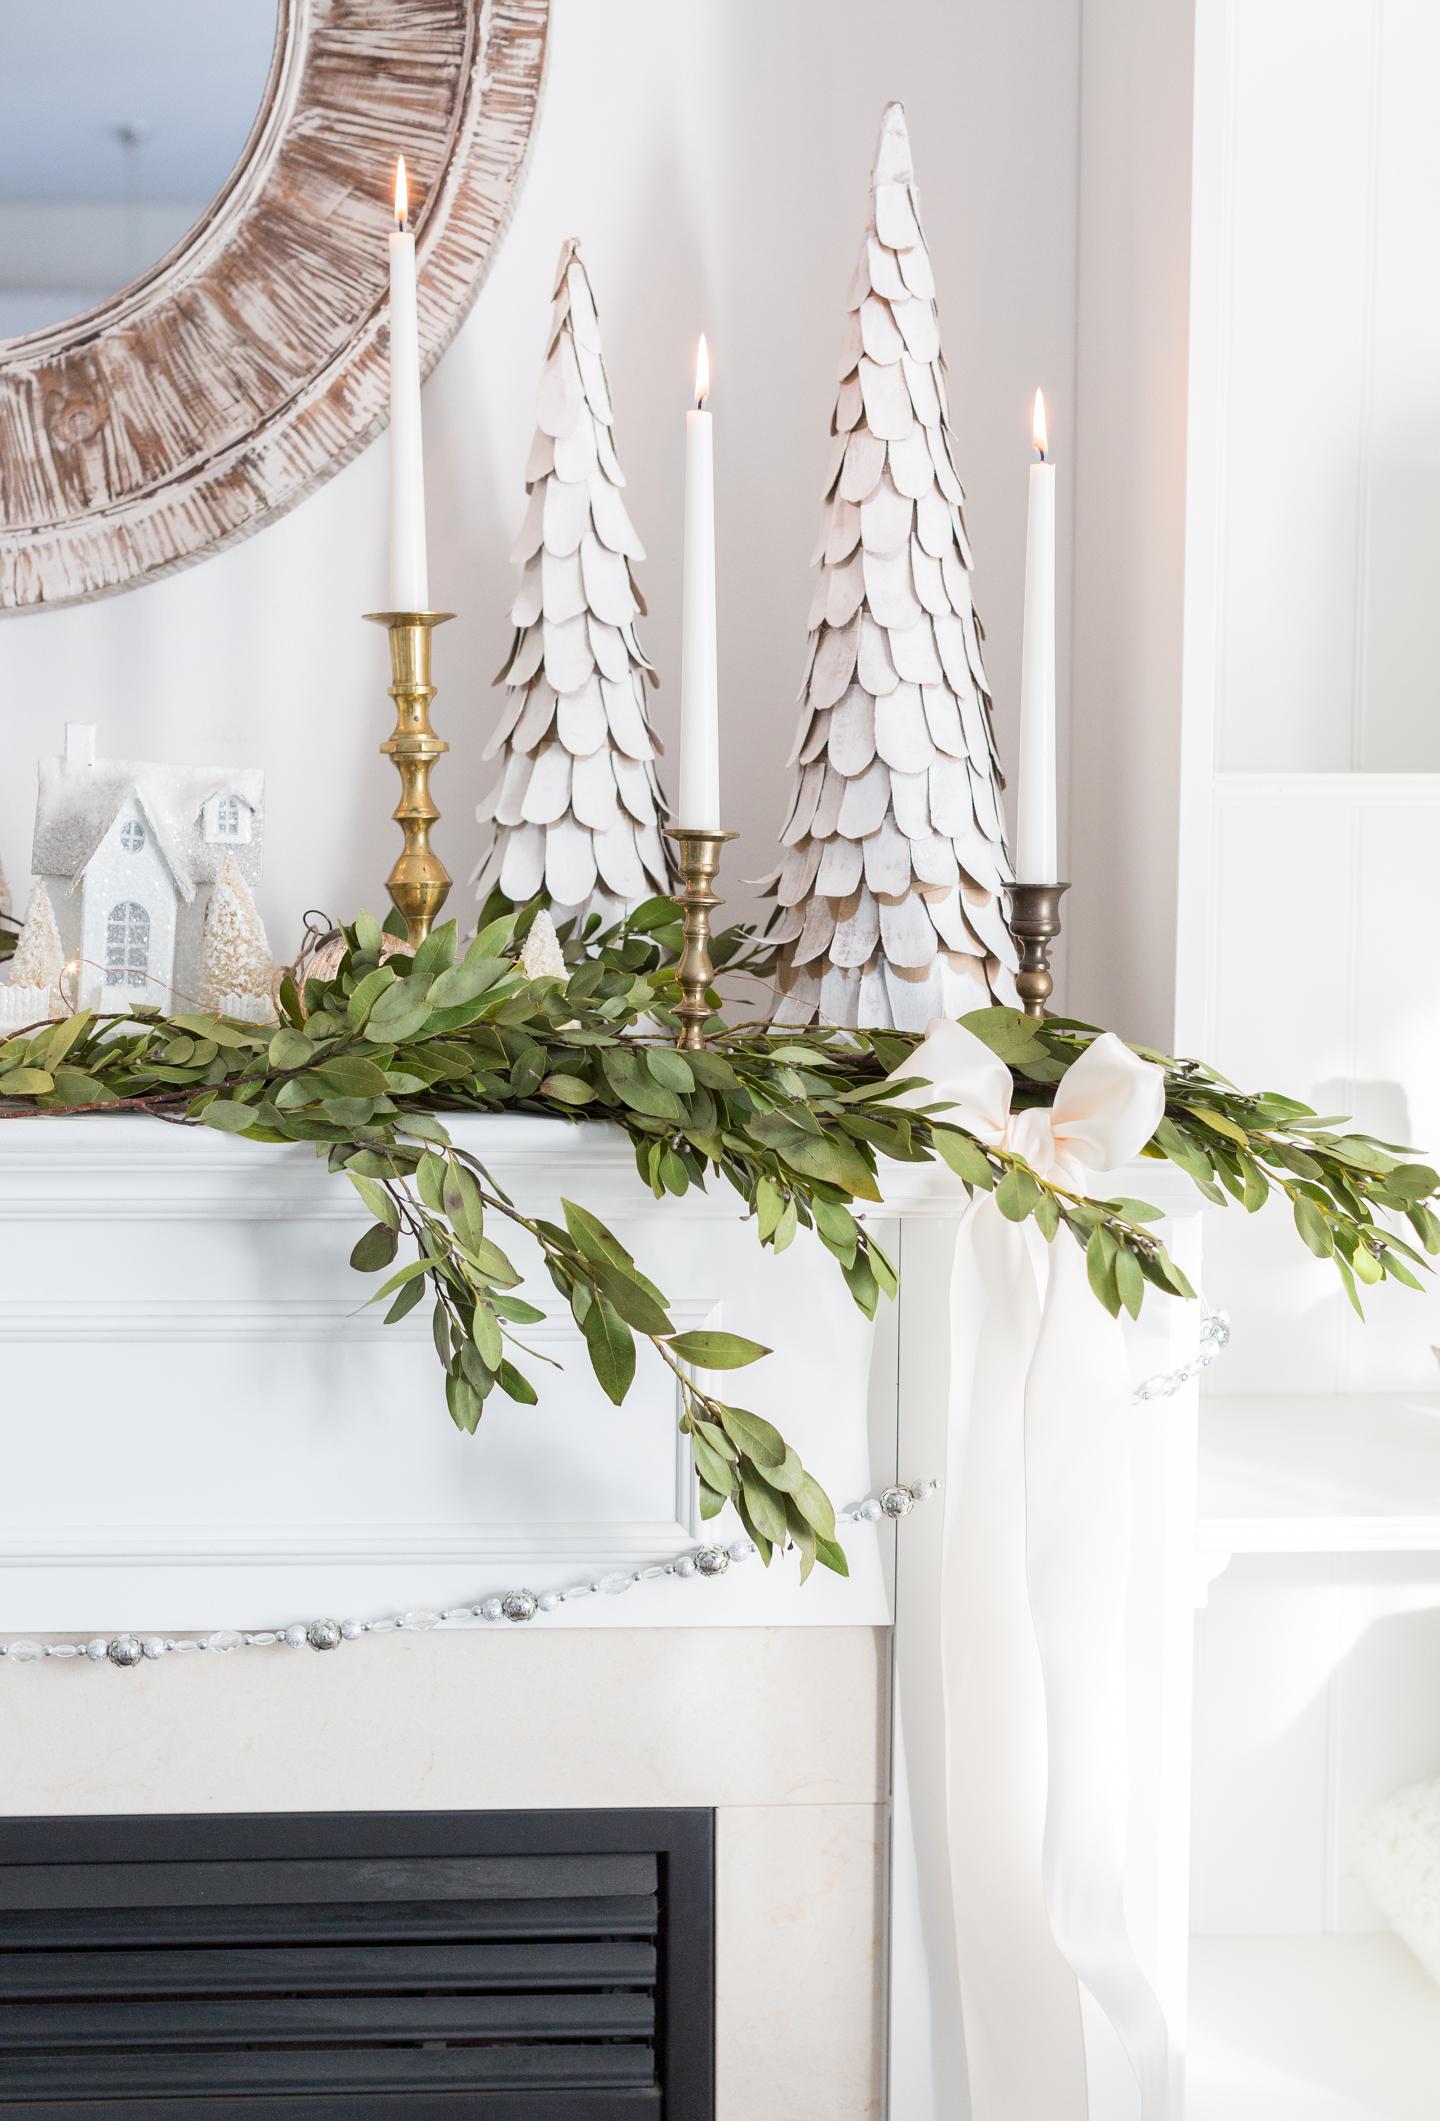 christmasfamilyroomcraftberrybush-6